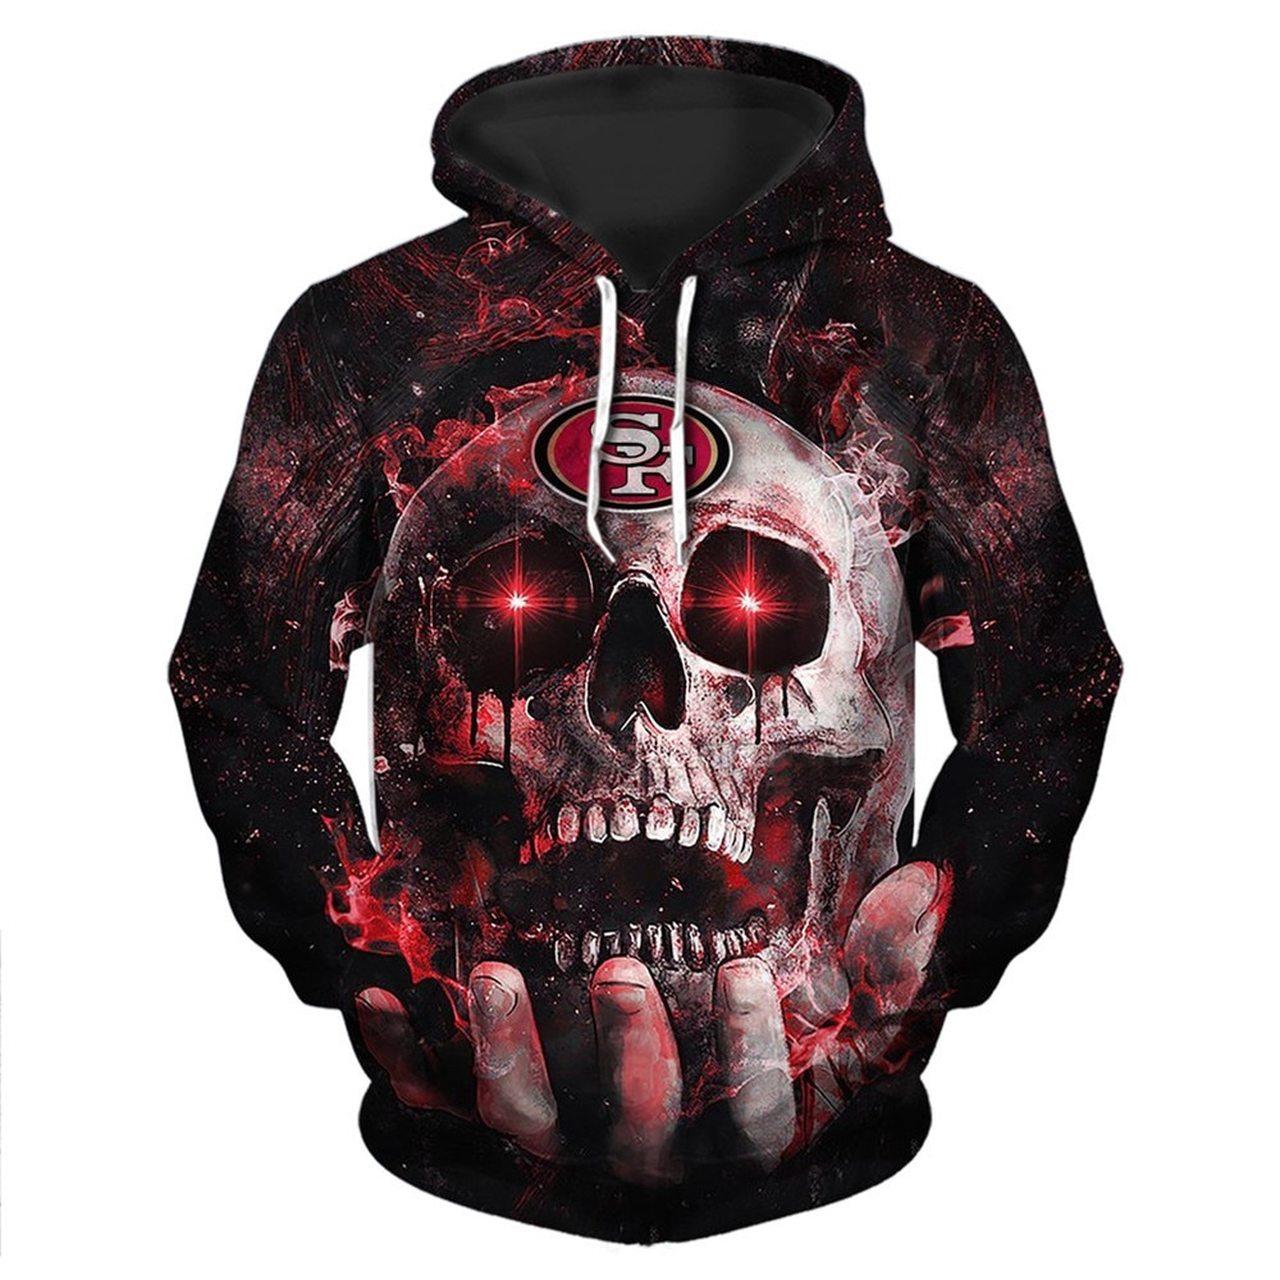 Electro skull san francisco 49ers full printing hoodie